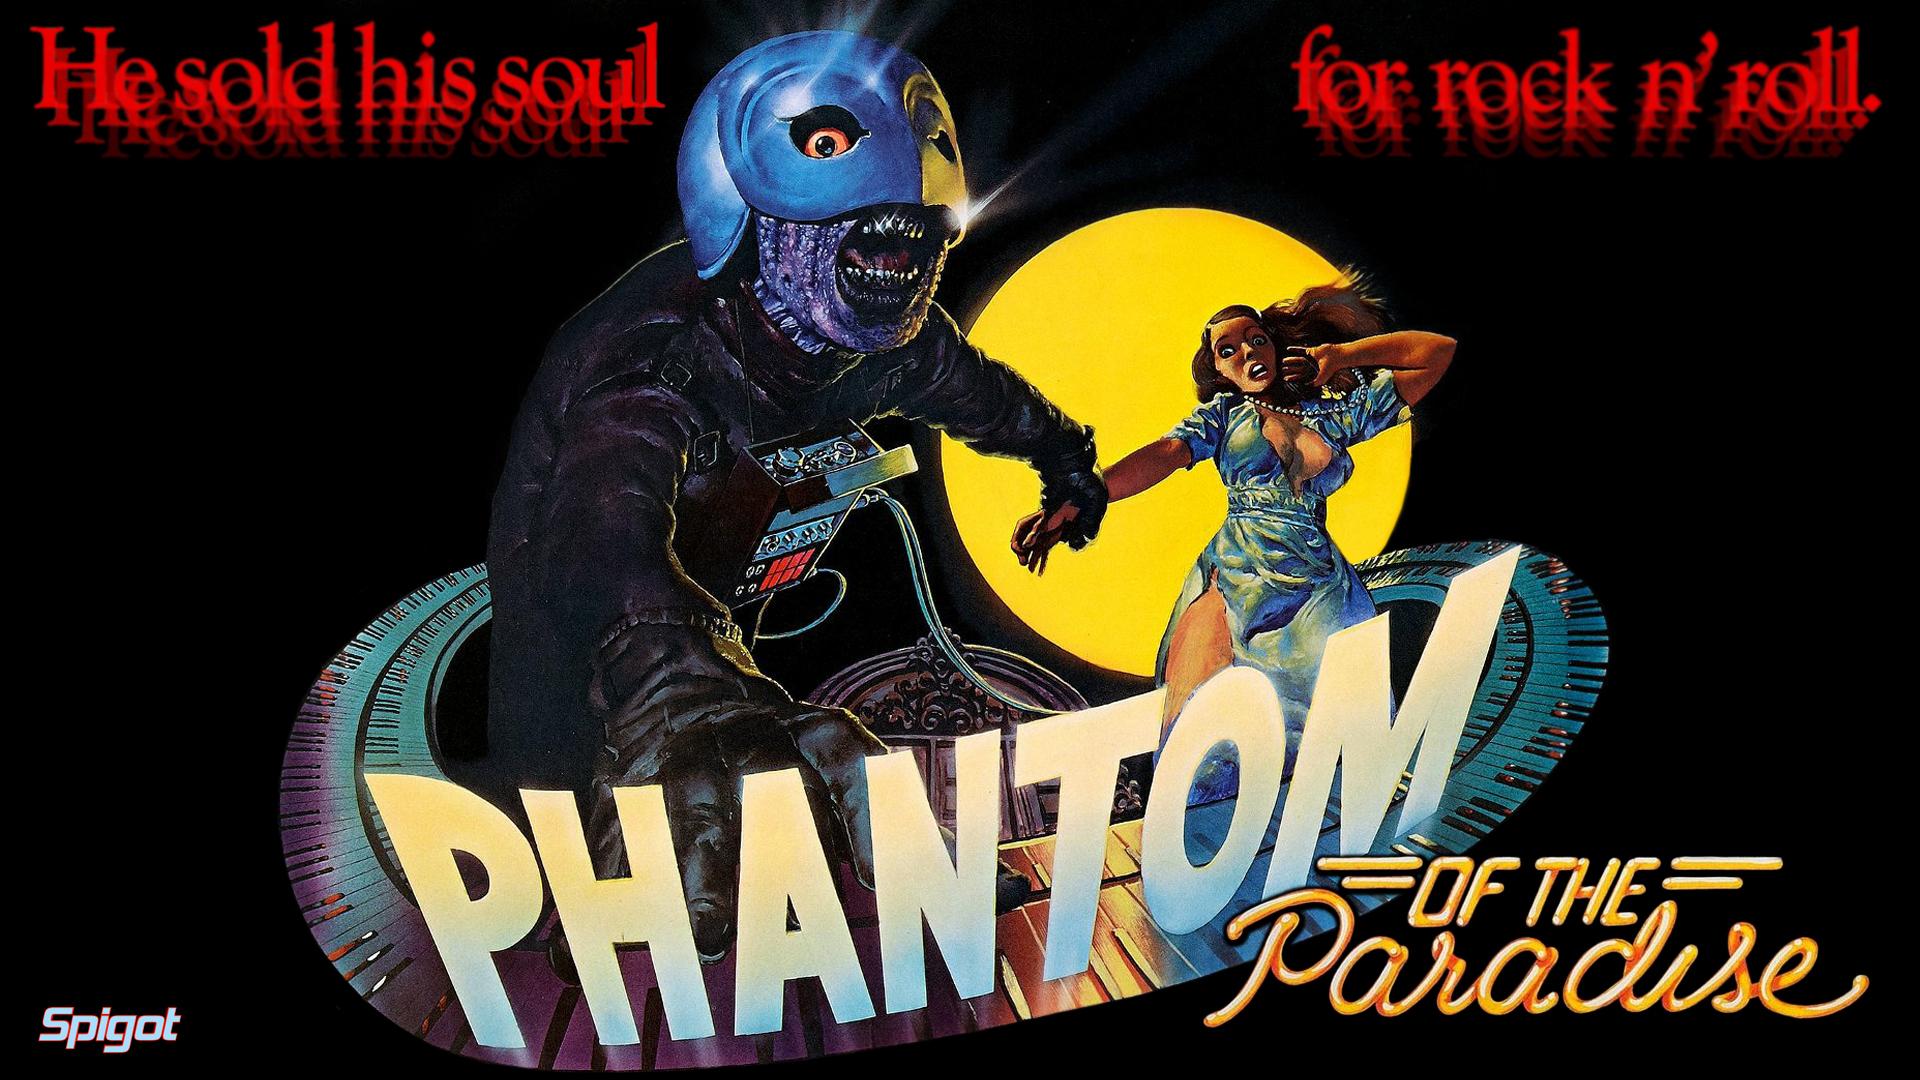 phantom of the paradise | george spigot's blog